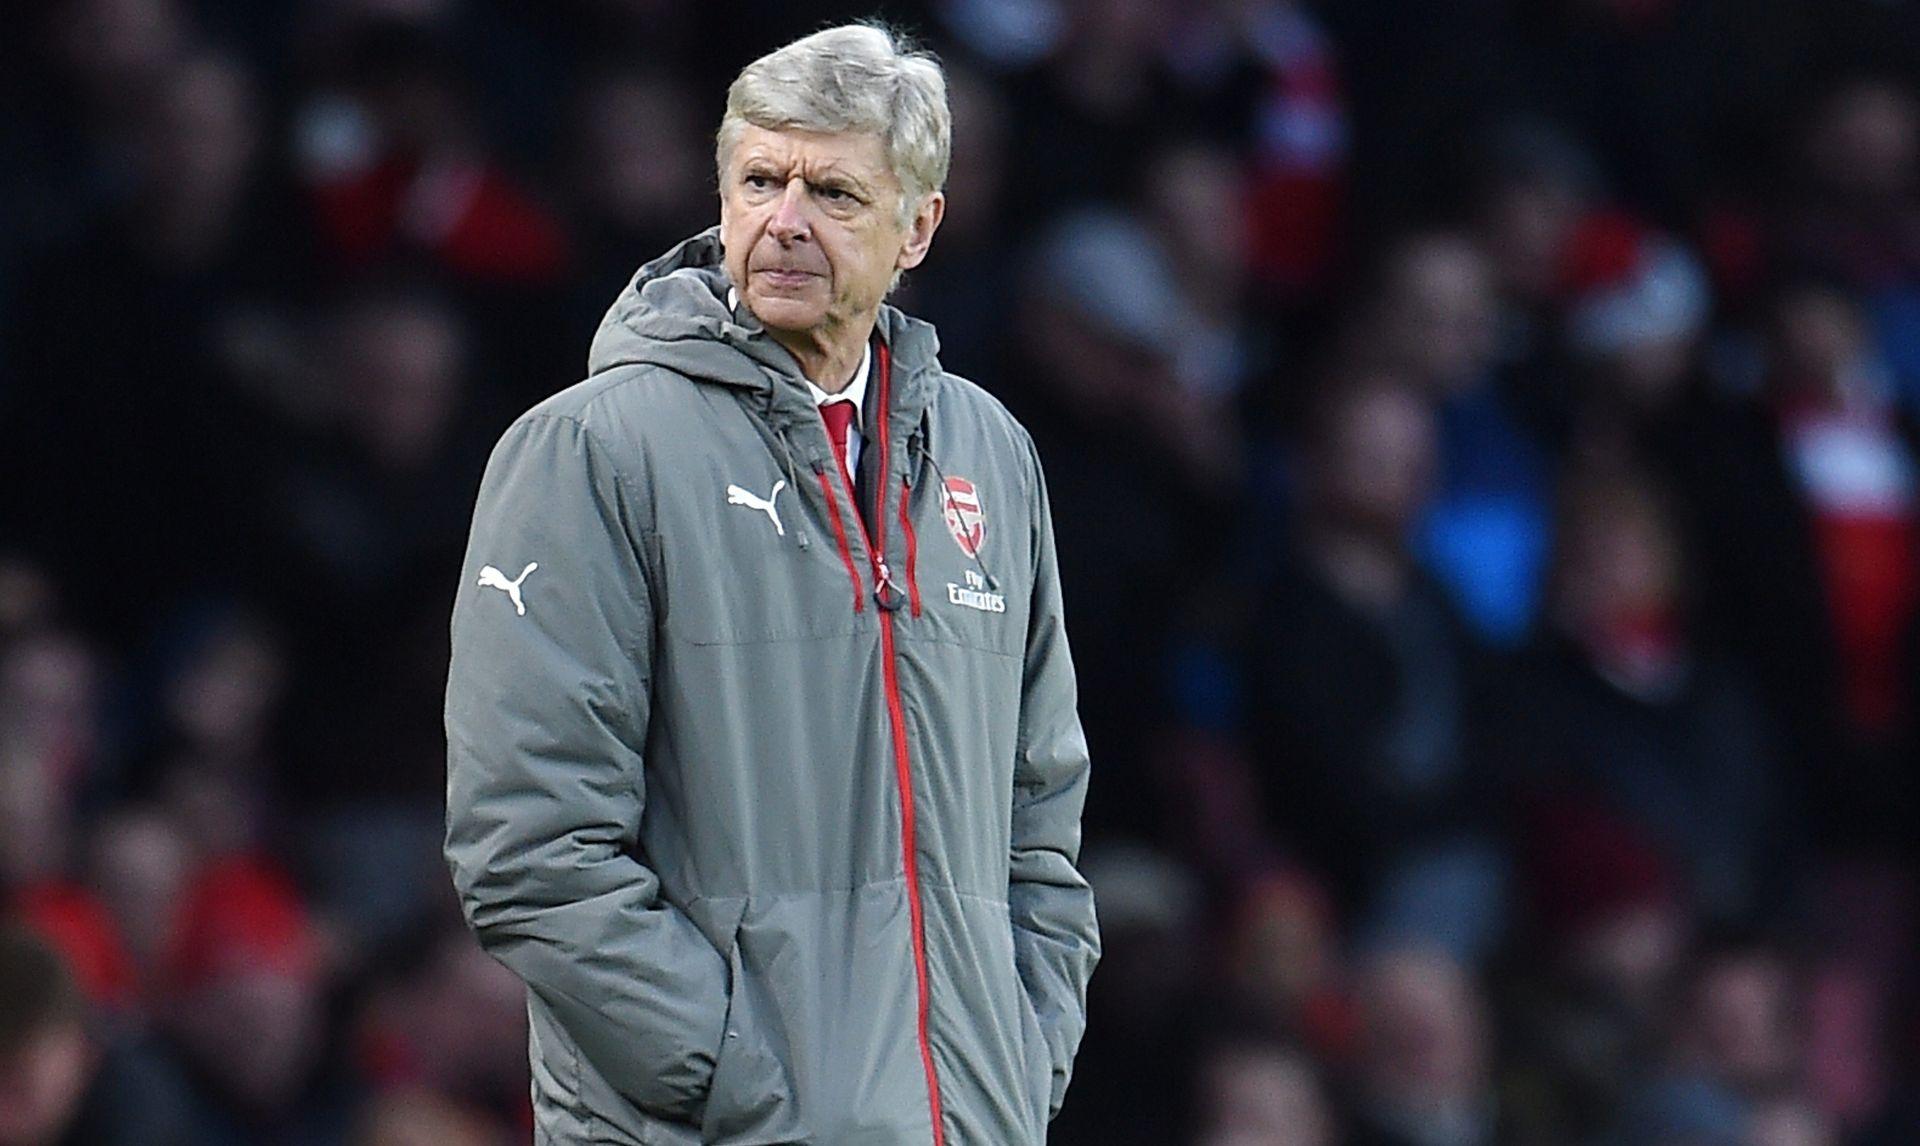 Wenger ipak ostaje u Arsenalu